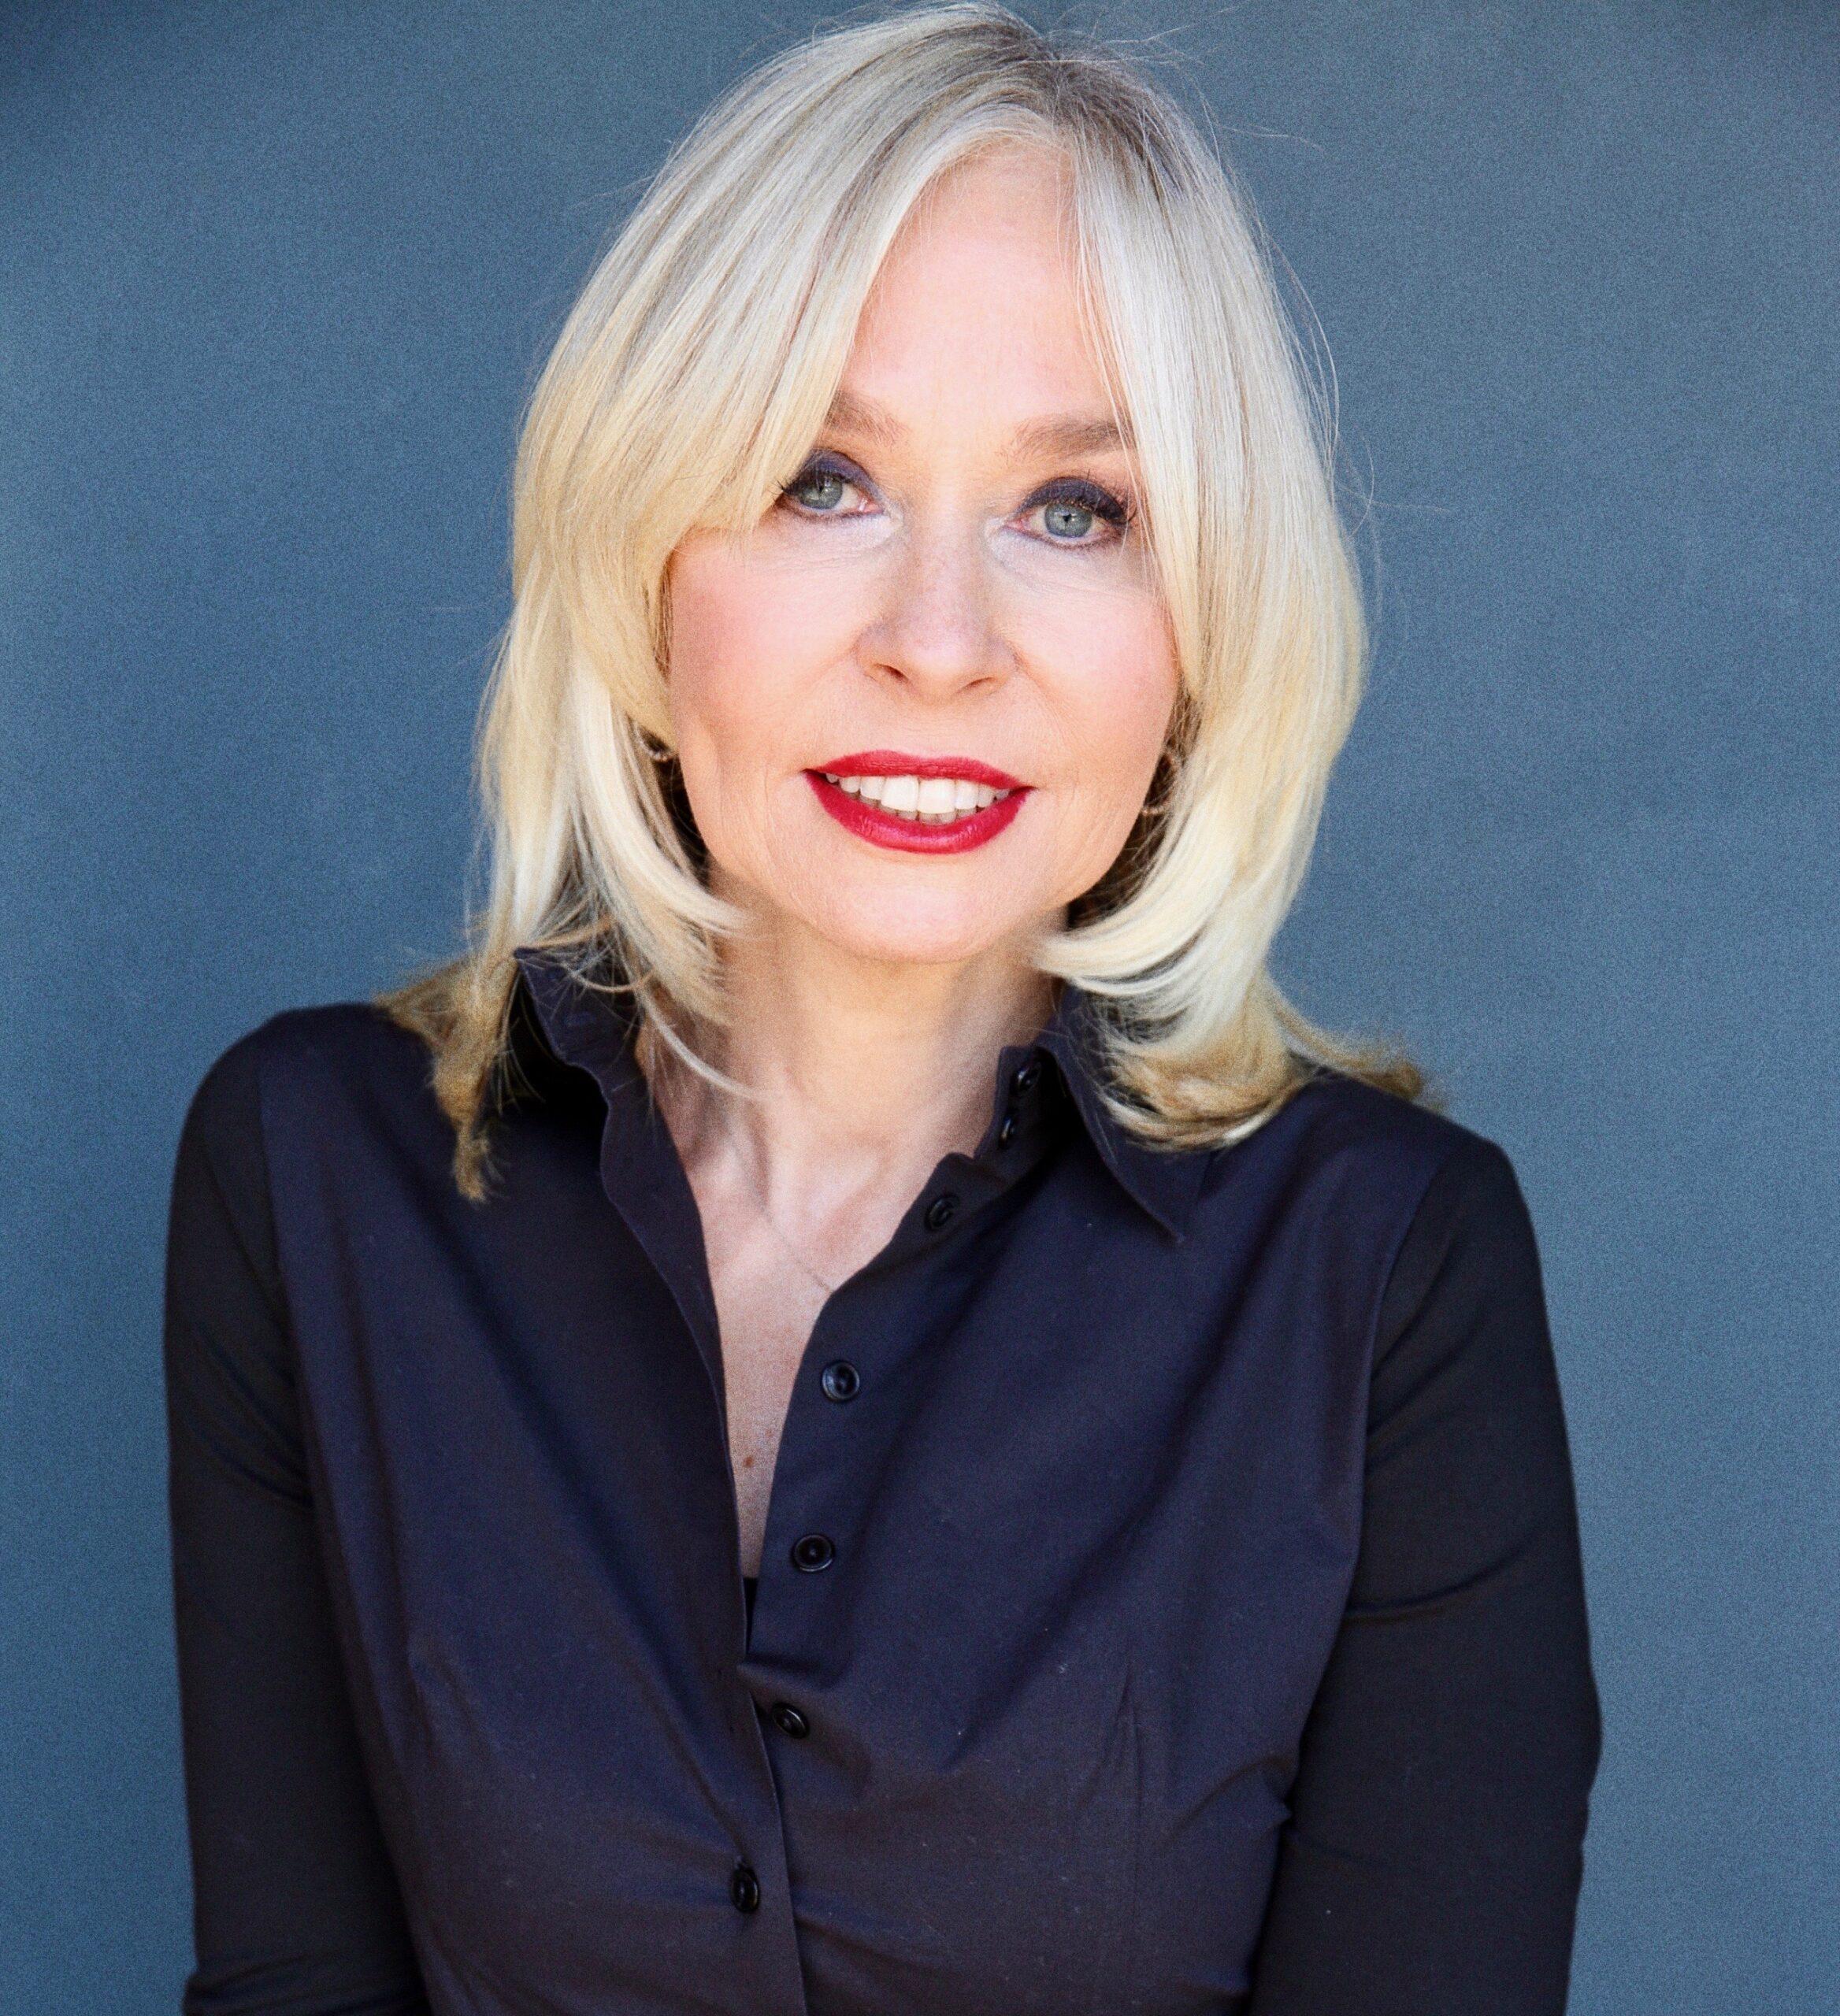 Portrait of Lisa Wedeen